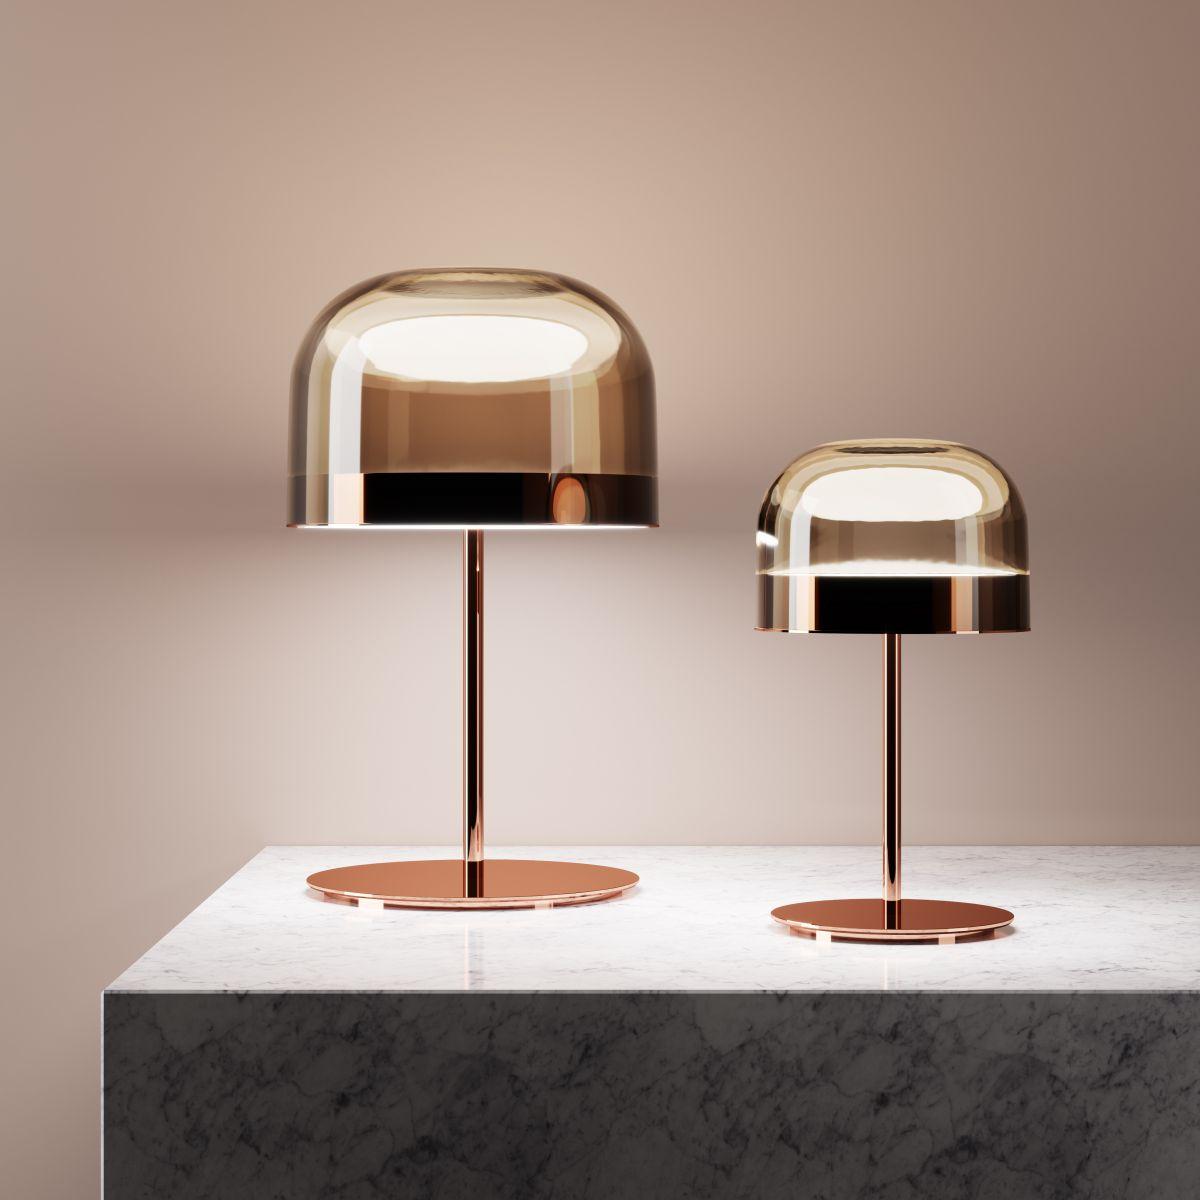 Lampada Equatore by FontanaArte